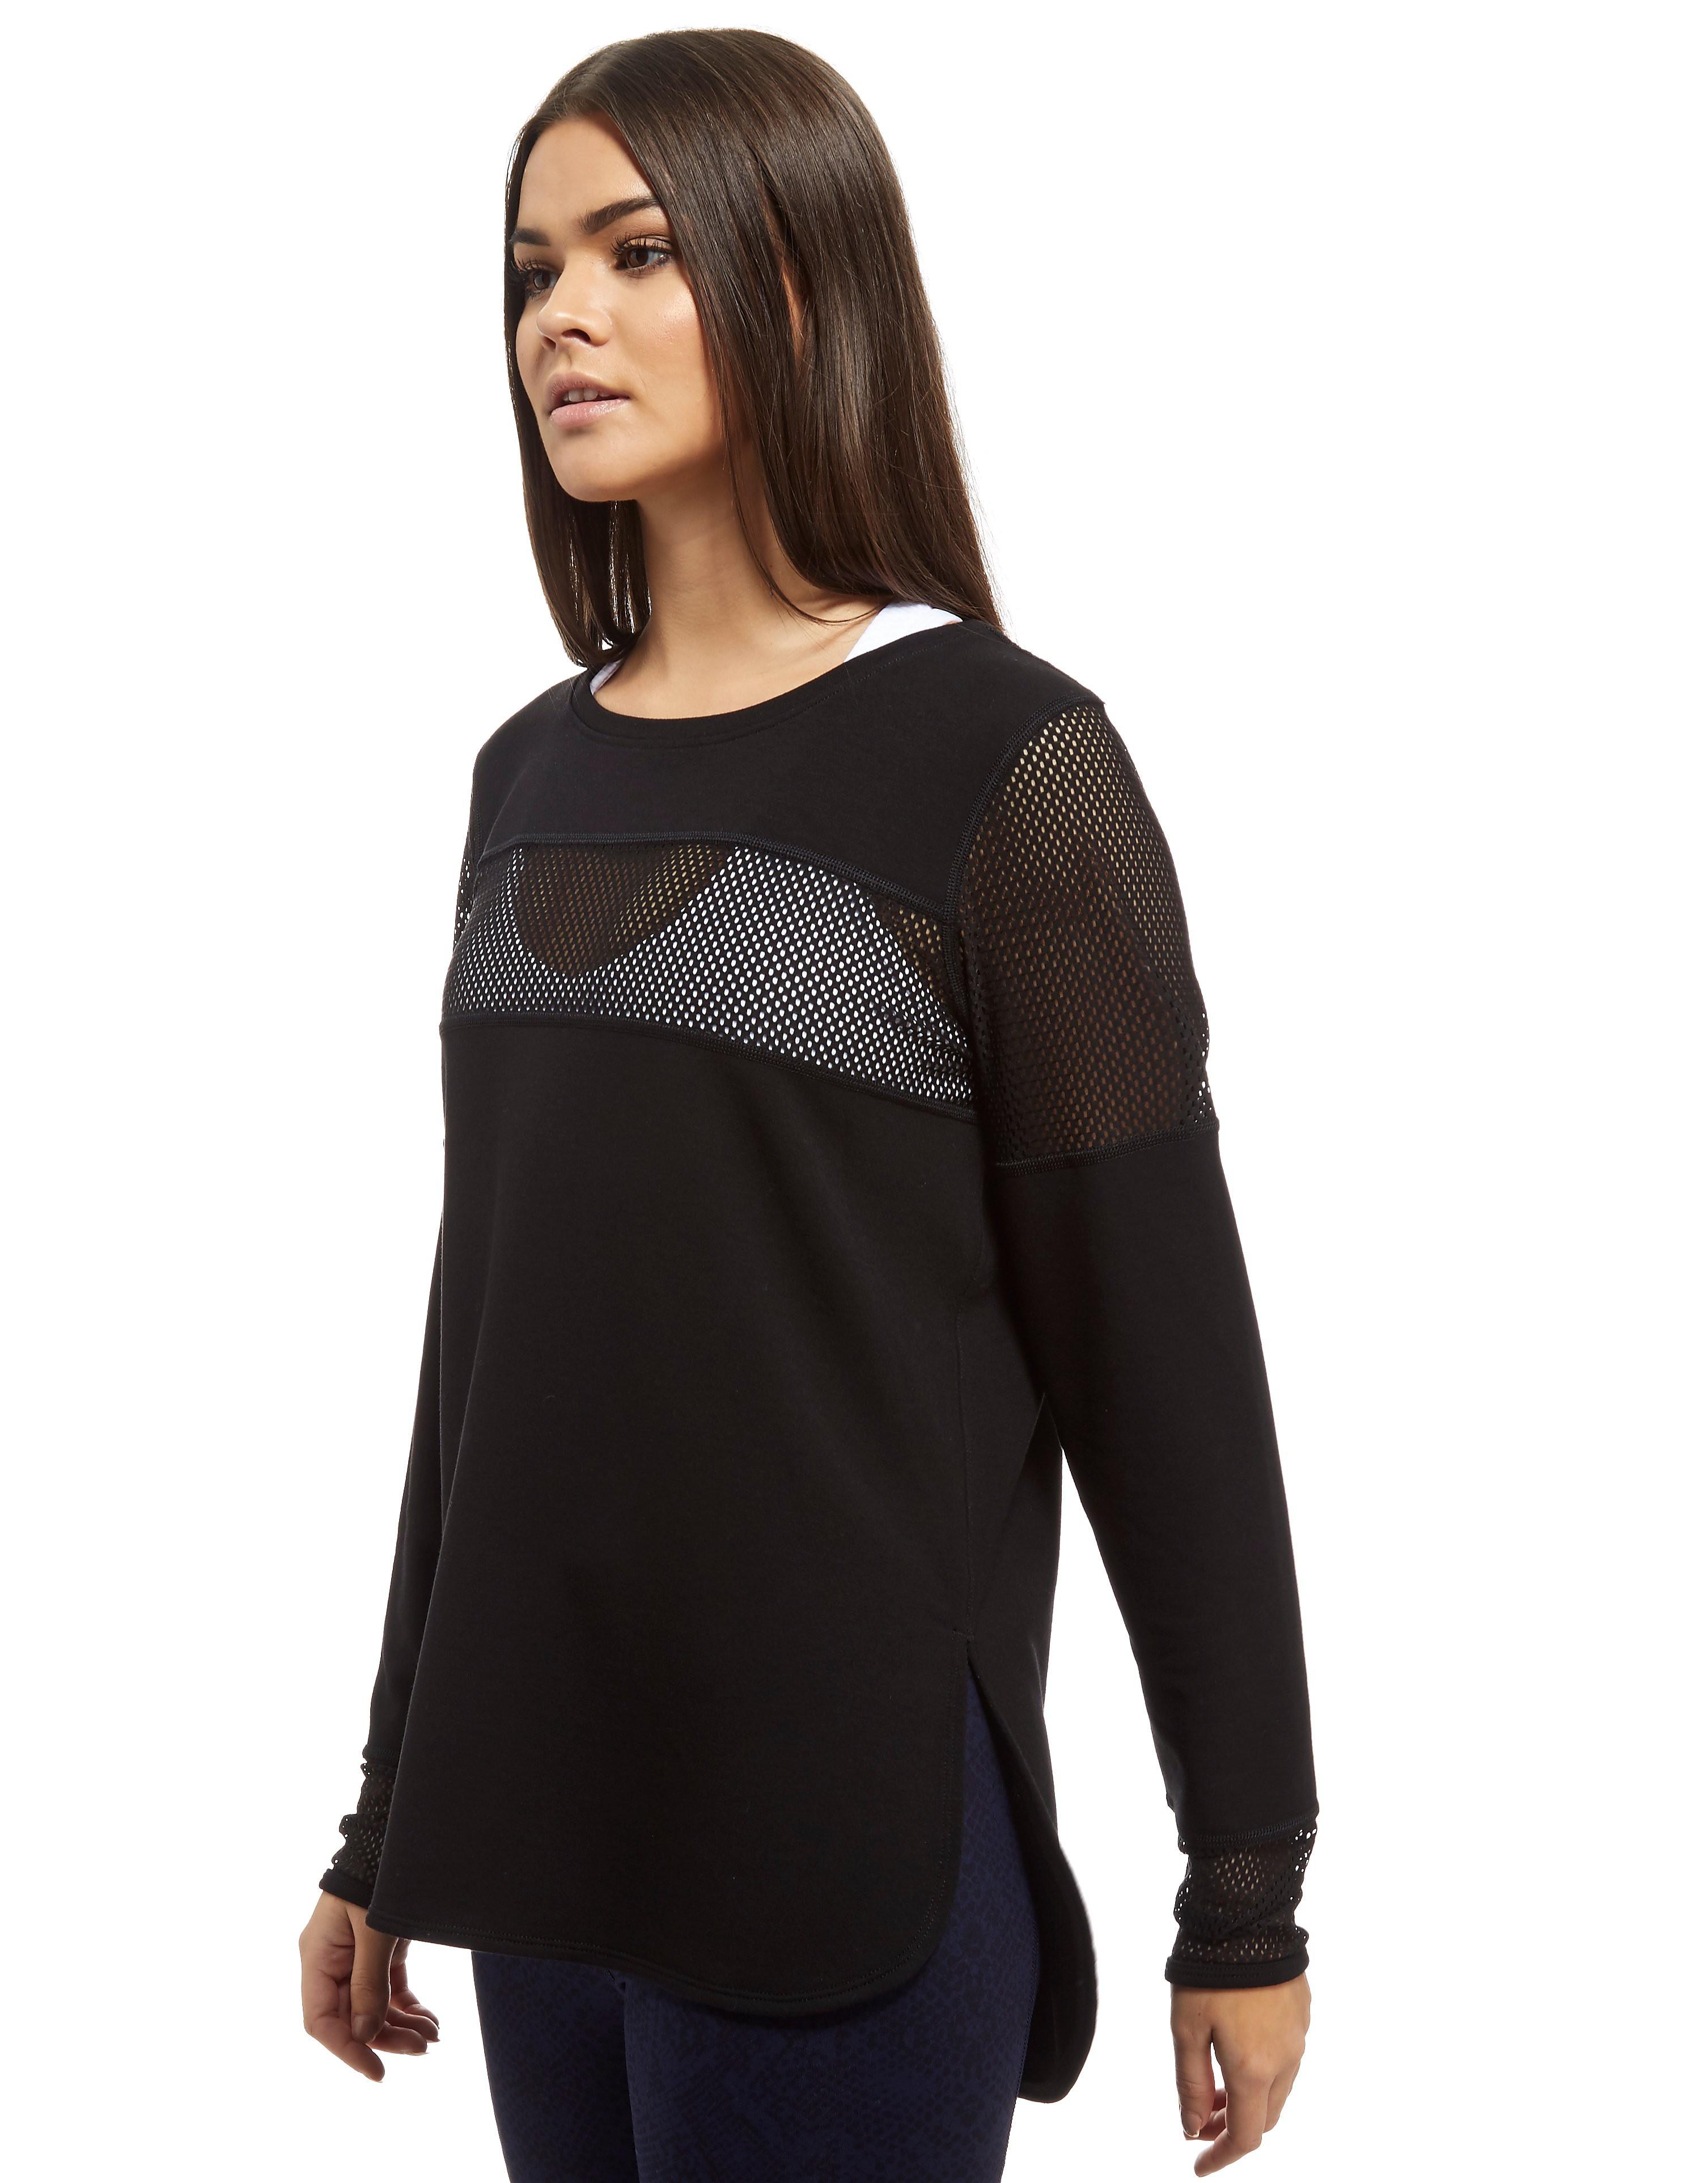 Lorna Jane Layered Long Sleeve Top